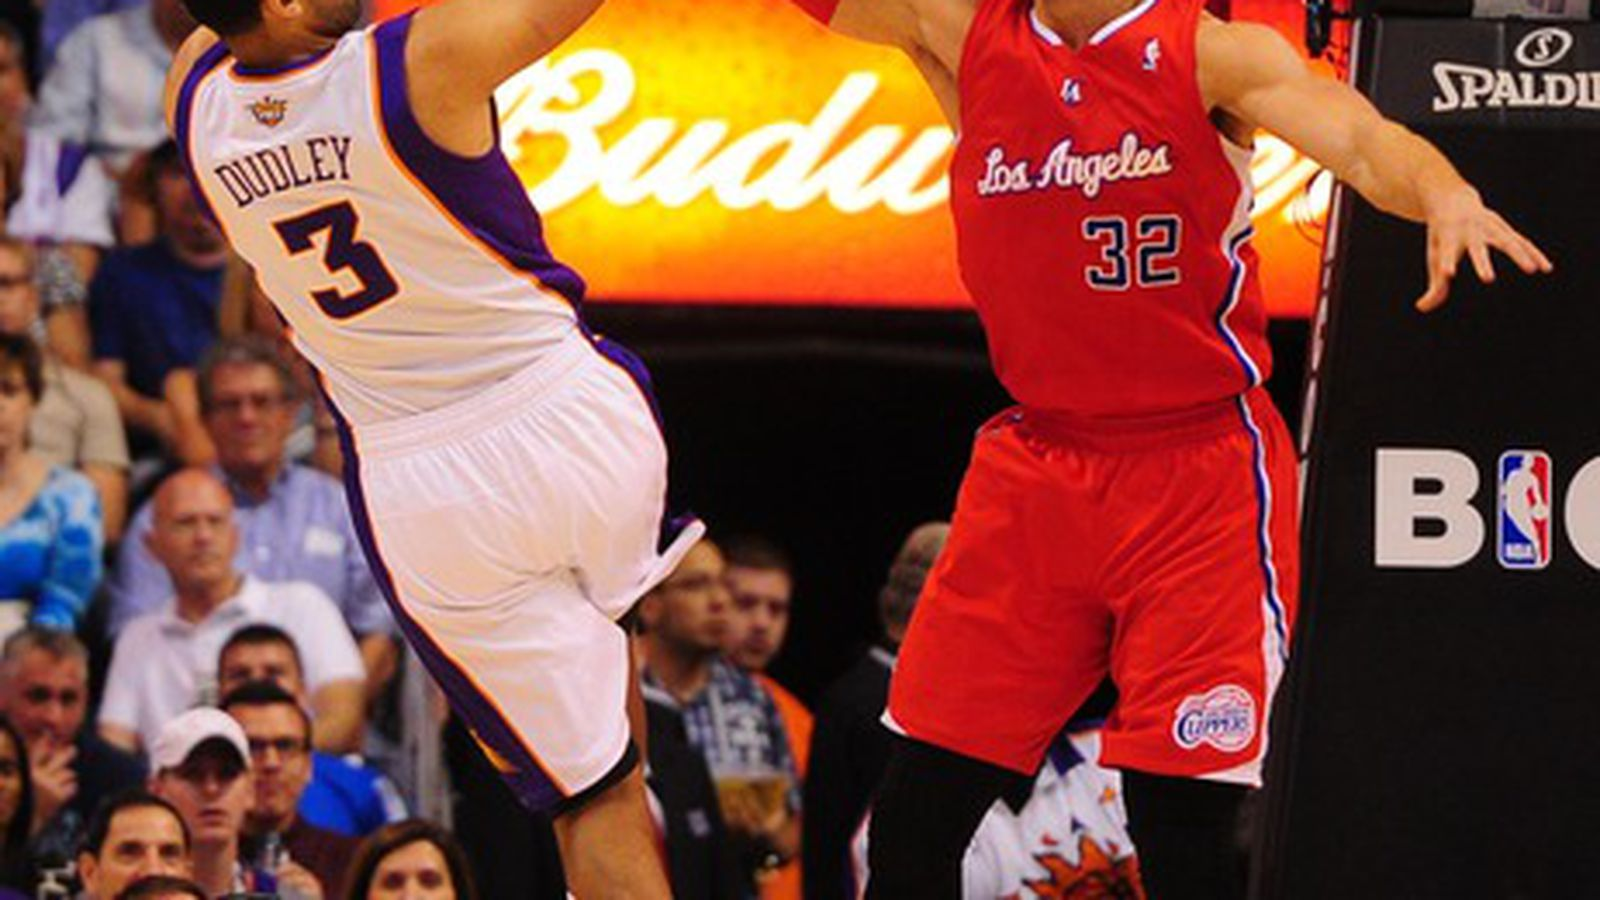 Clippers Vs. Suns: Phoenix Snaps L.A. Win Streak At 5 - SB ...